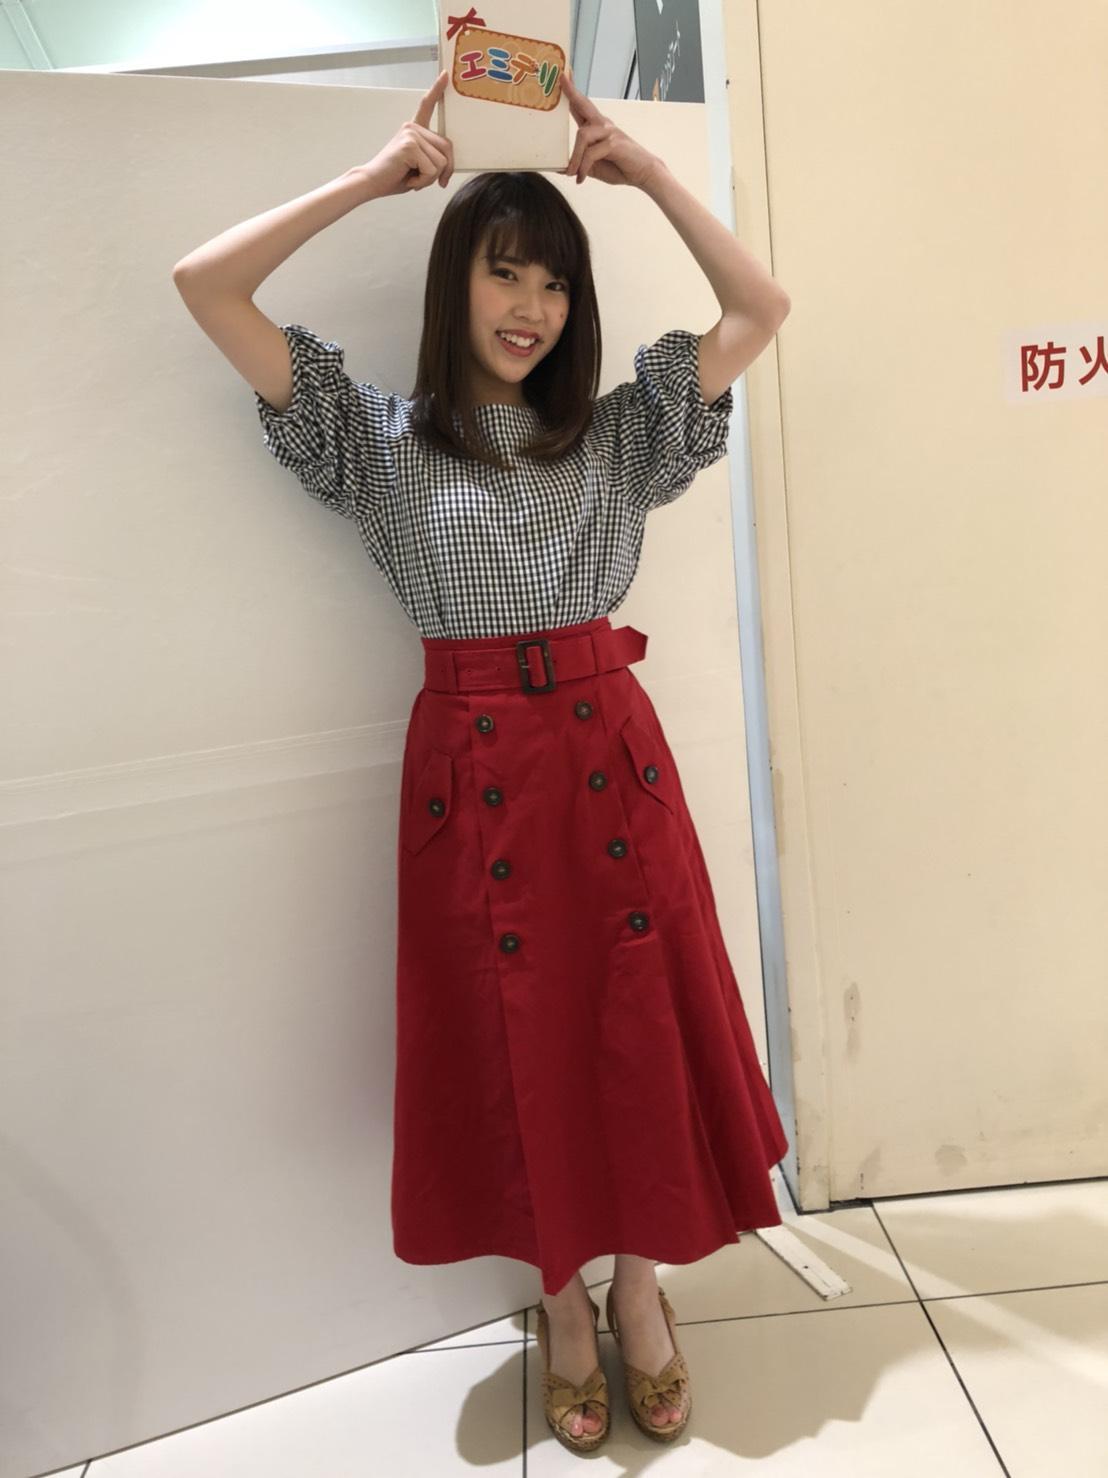 https://emifull.jp/emifulls_blog/11th/uploads/image2%20%288%29.jpeg